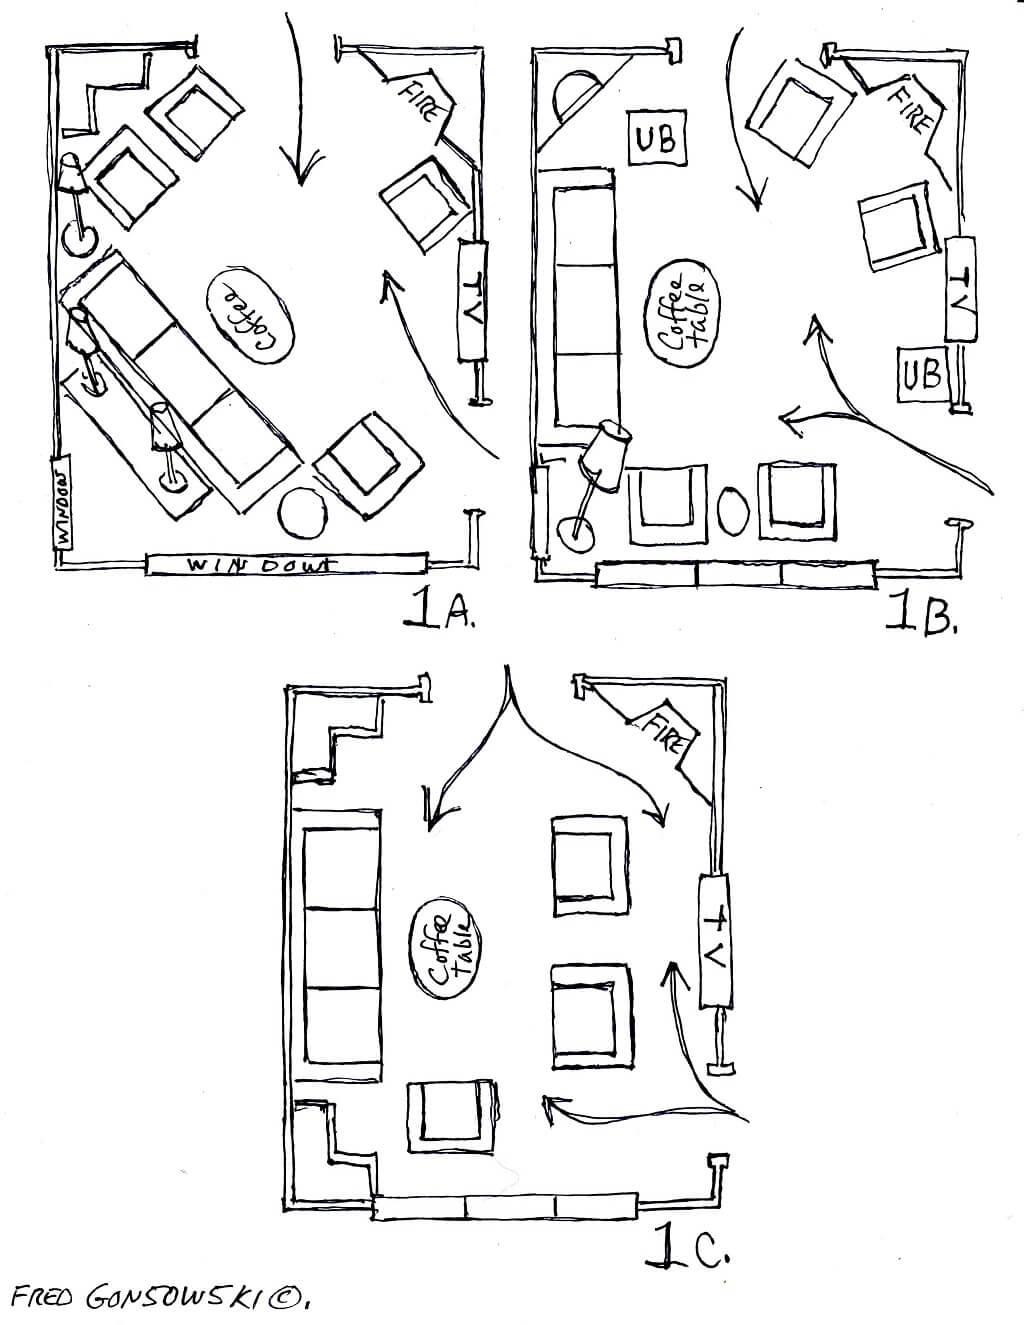 Top 5 Tips To Arrange Living Room Furniture Interior